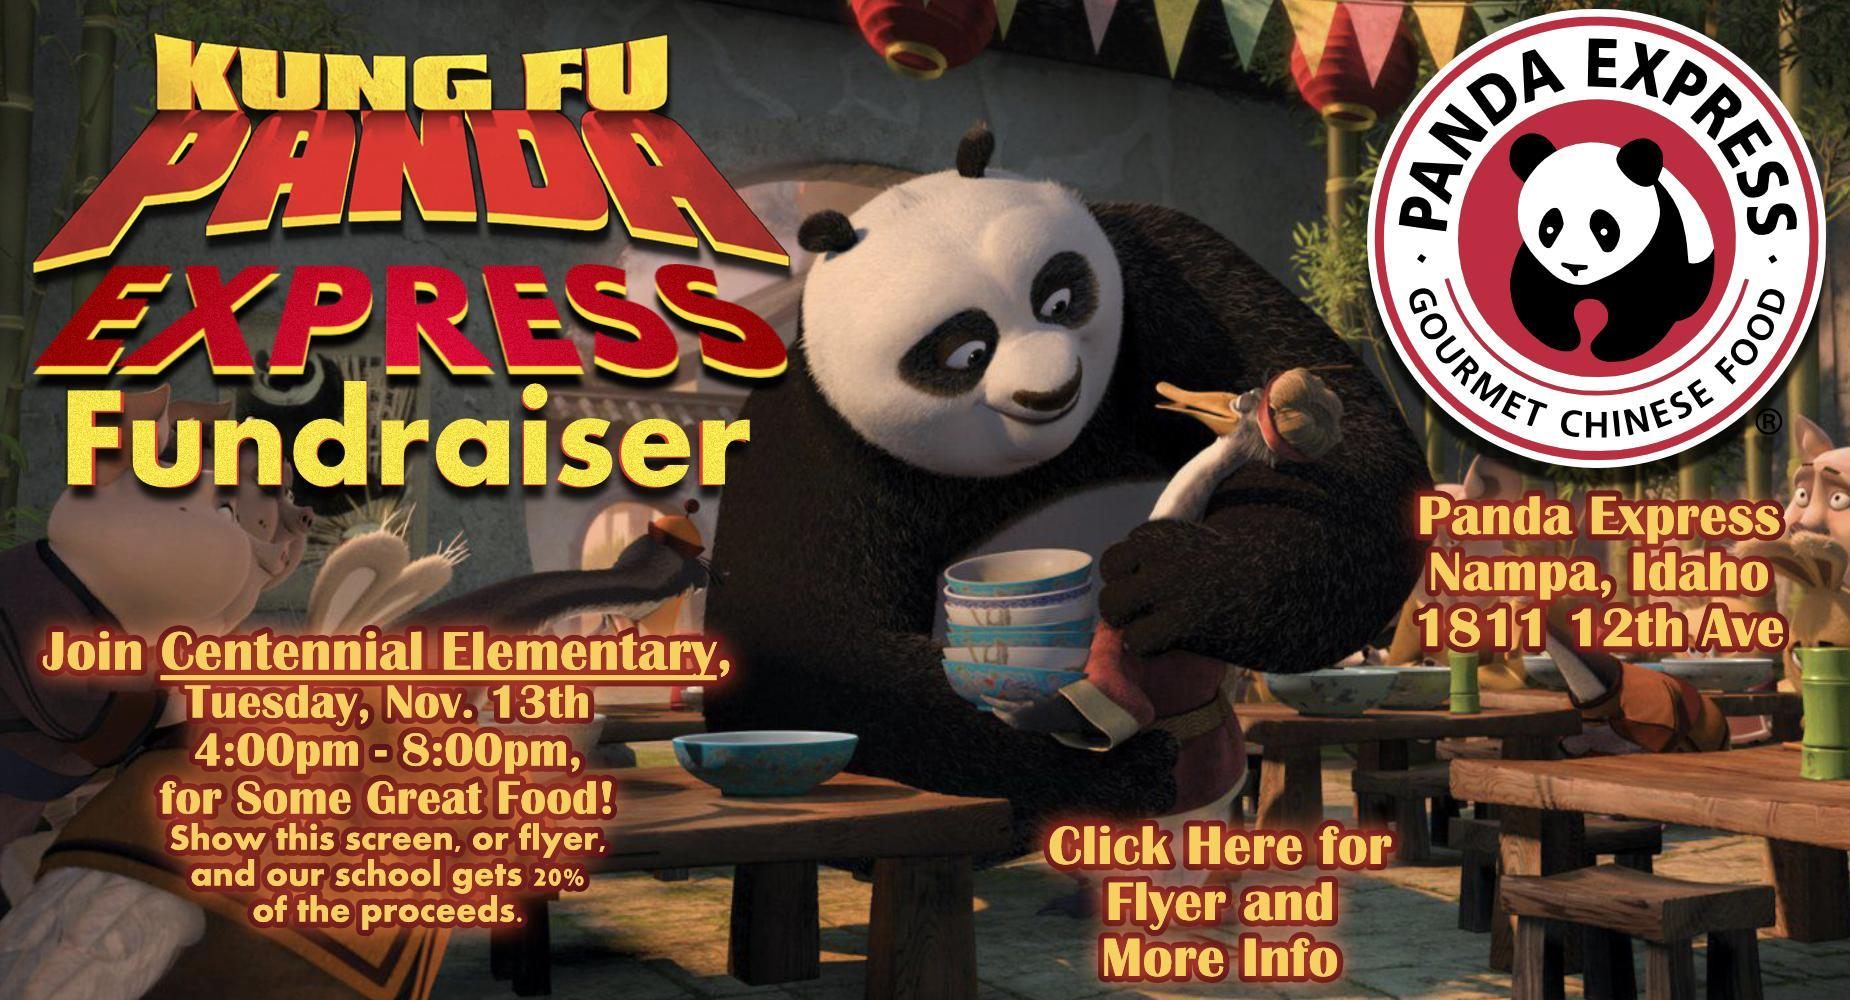 Panda Express Fundraiser - Nov. 13th